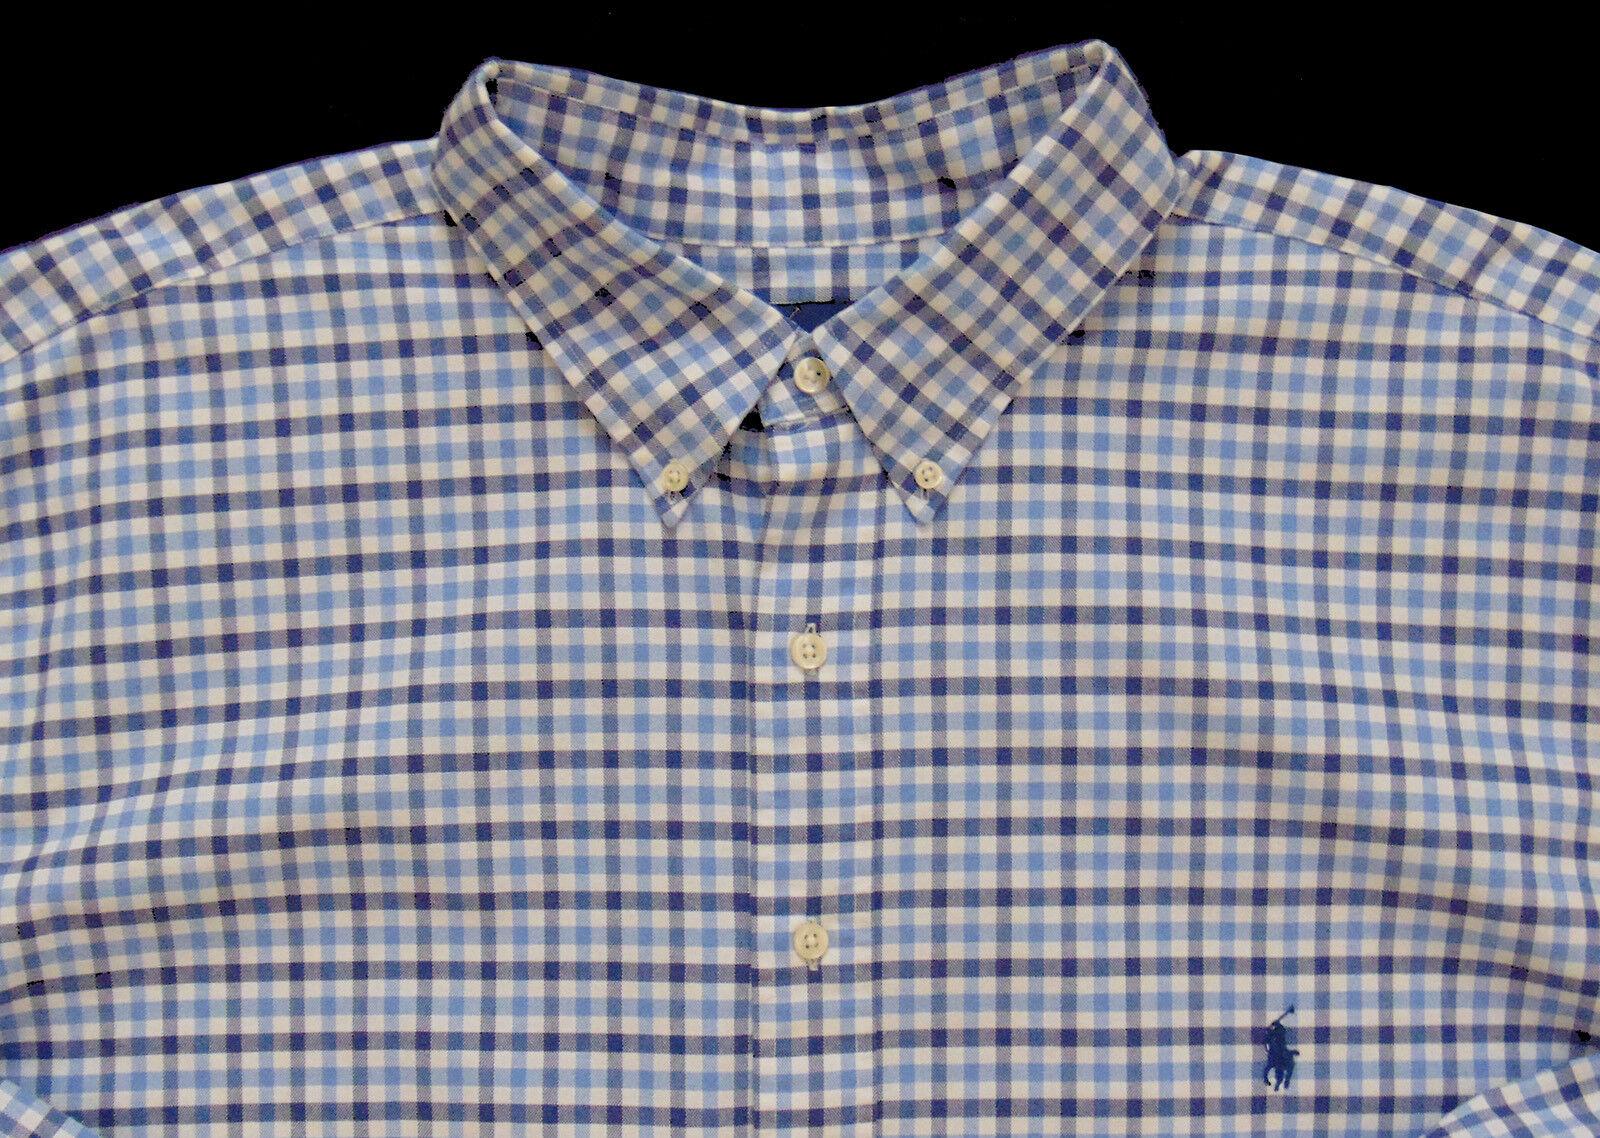 Men's RALPH LAUREN White bluee Pinpoint Oxford Plaid Shirt 3X 3XL 3XB BIG NWT NEW